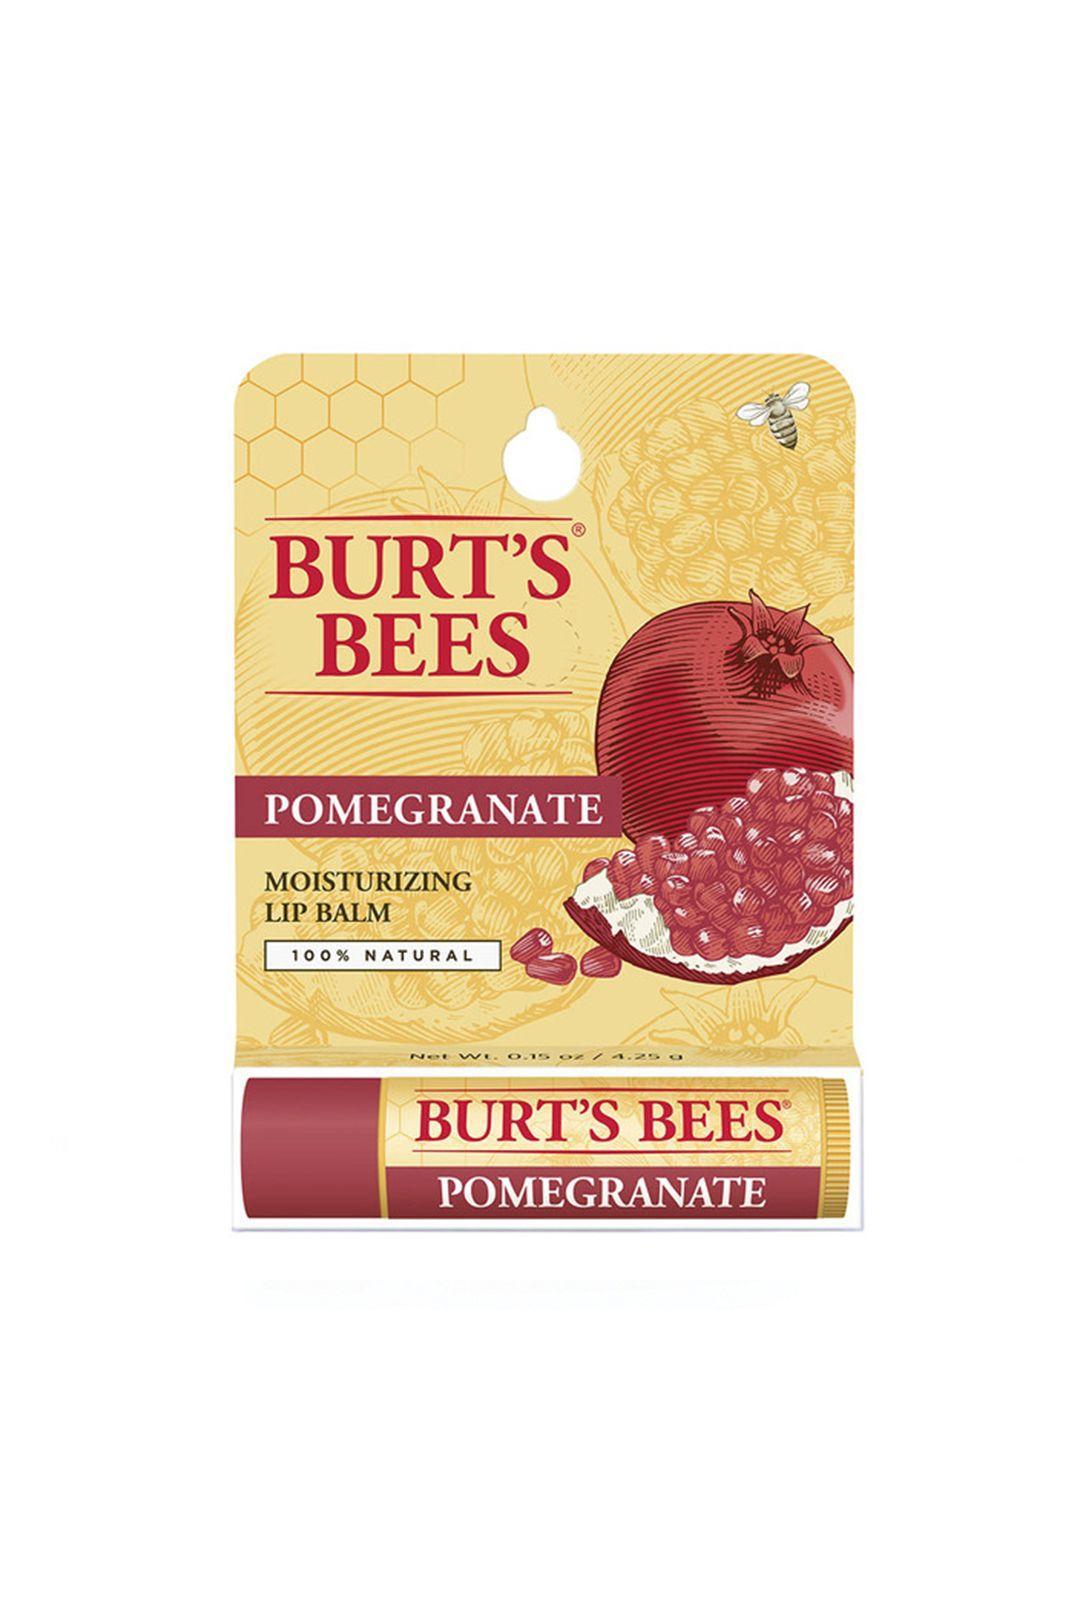 burts-bees-lip-balm-pomegranate-replenishing-tube